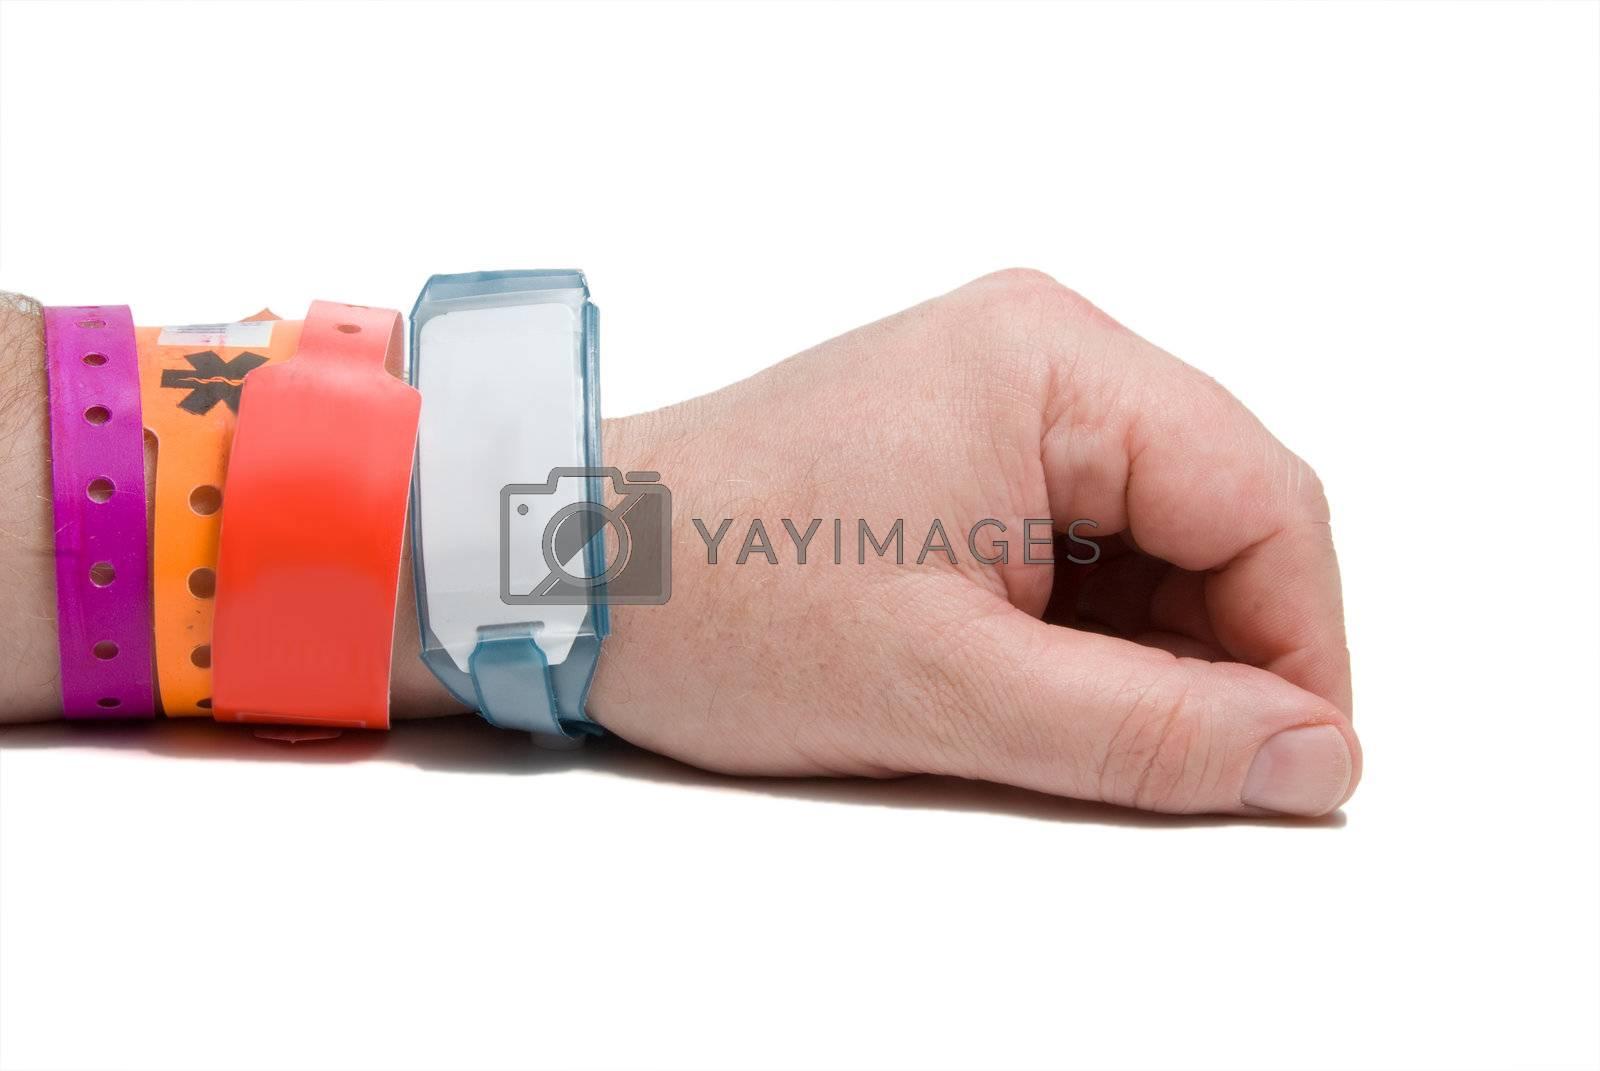 A brand new hospital patient ID bracelet.